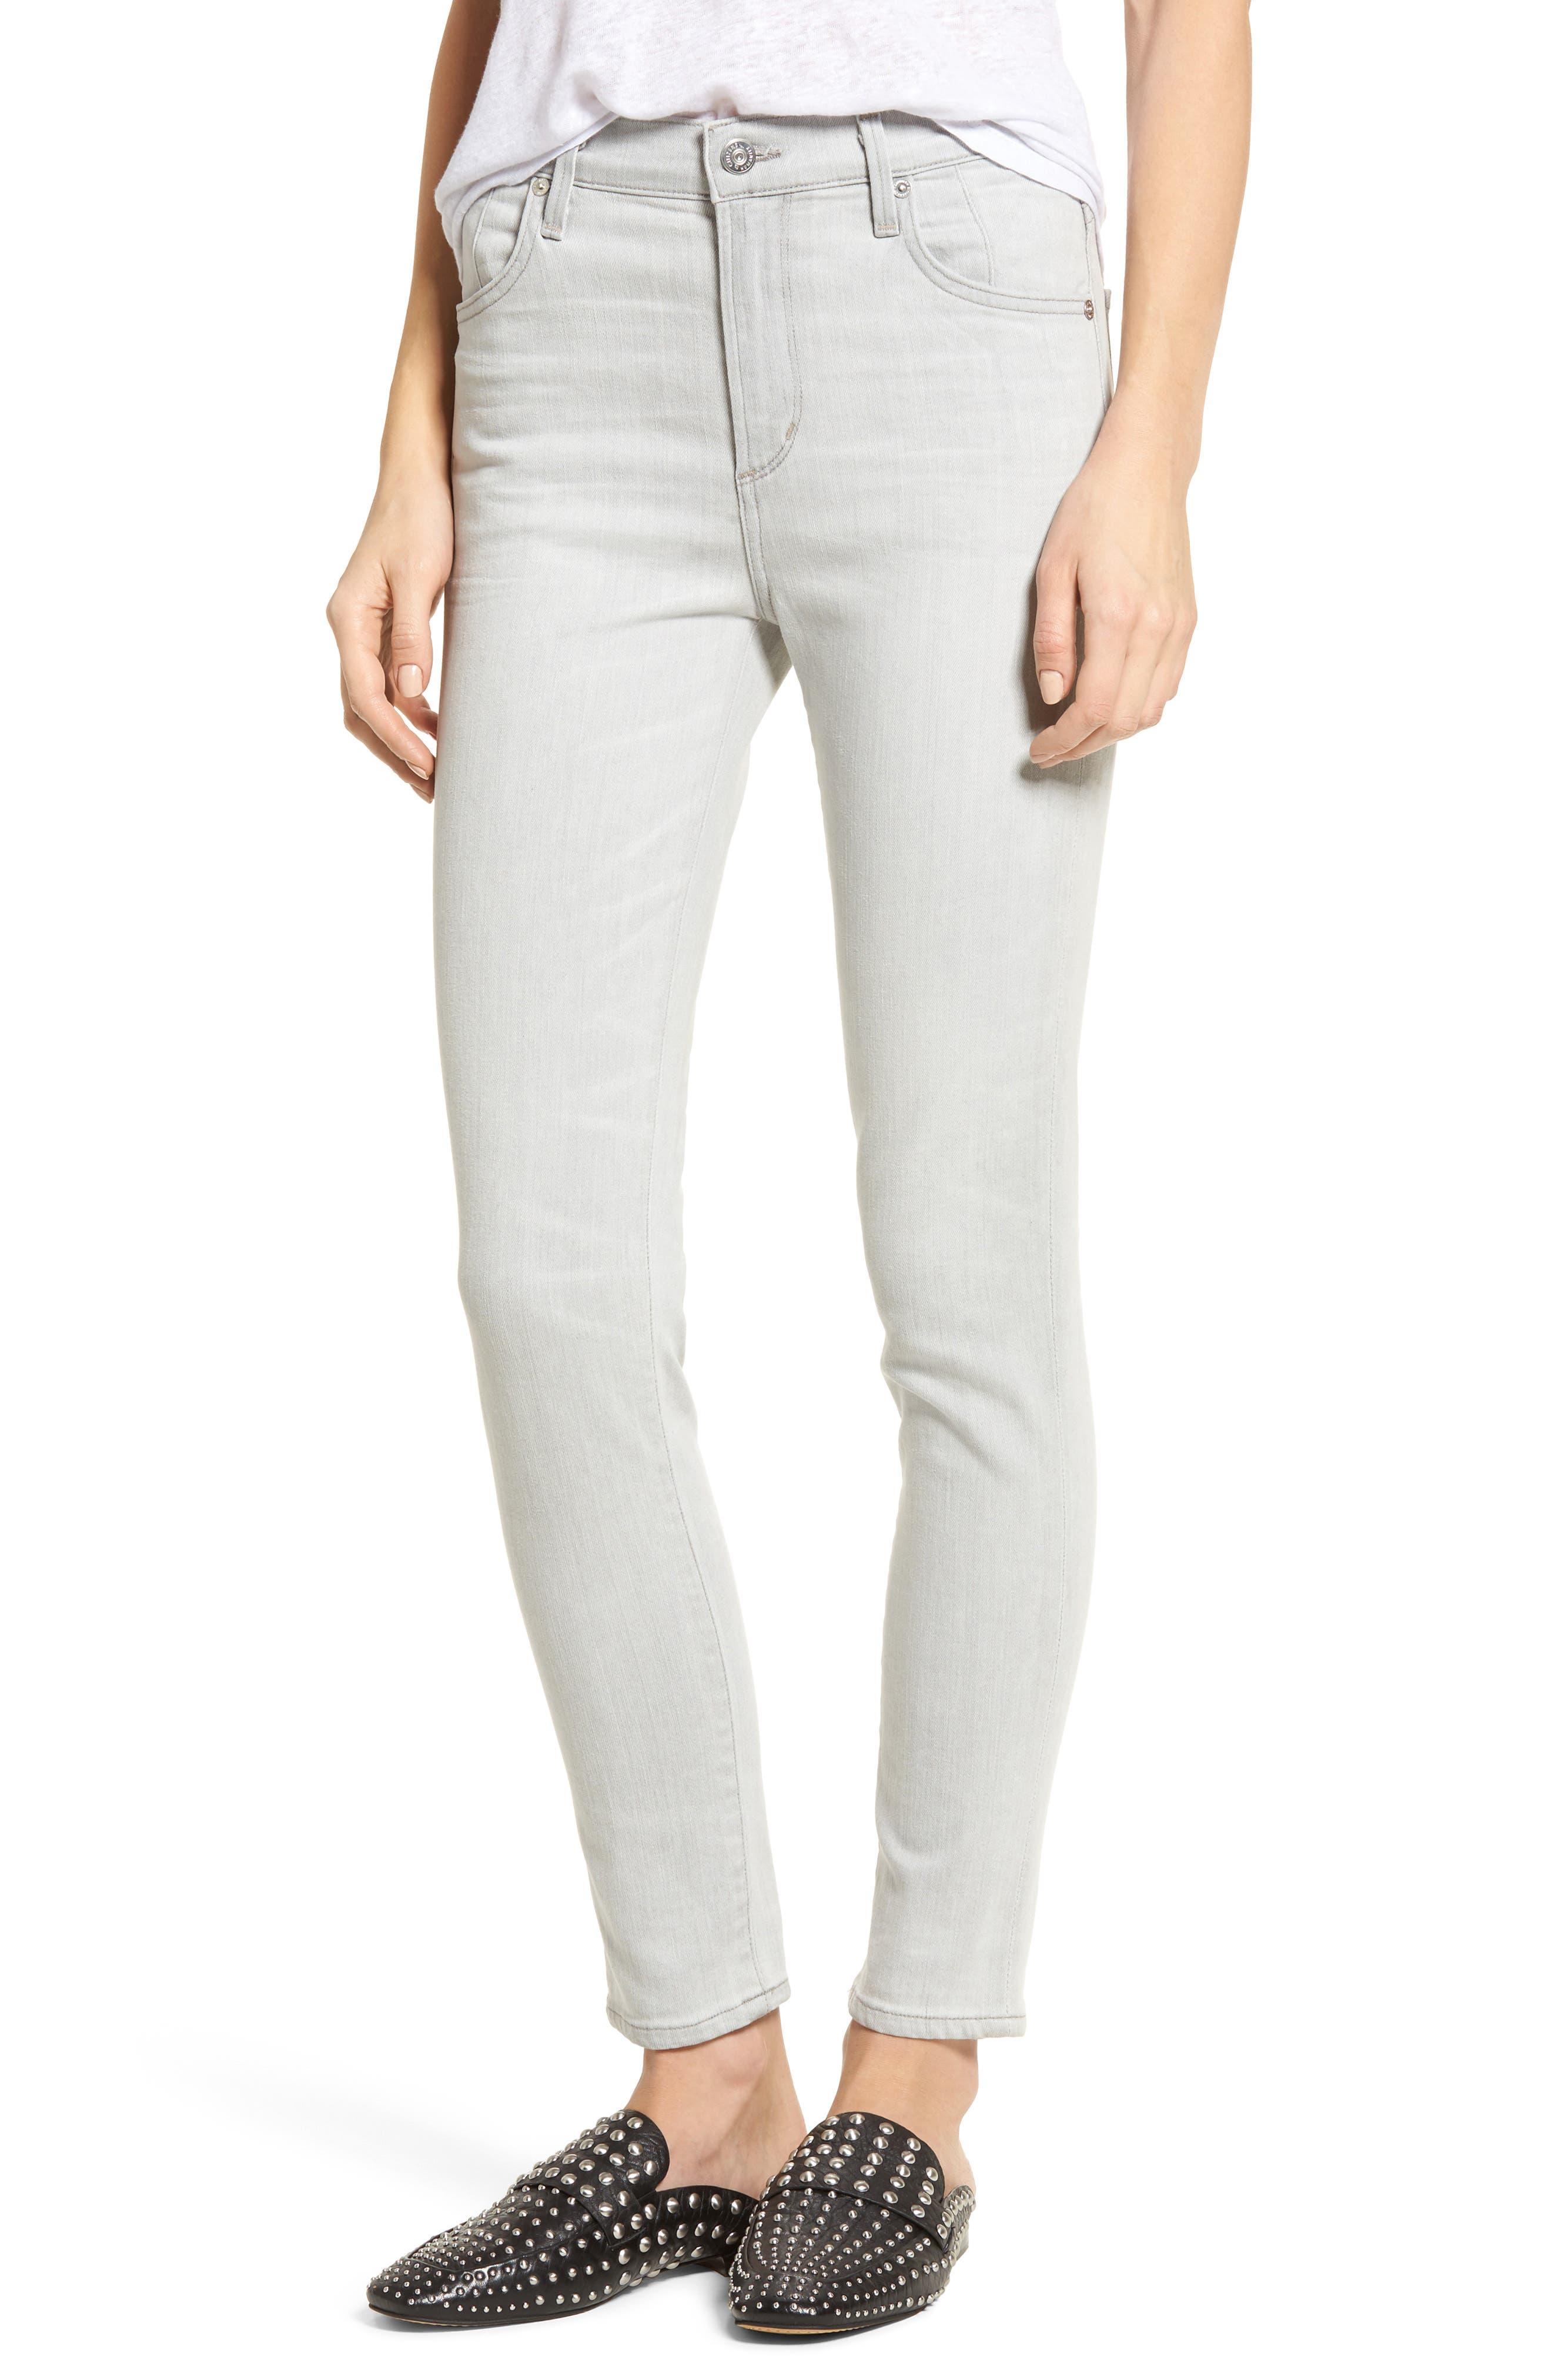 Carlie High Waist Ankle Skinny Jeans,                         Main,                         color, Greystone